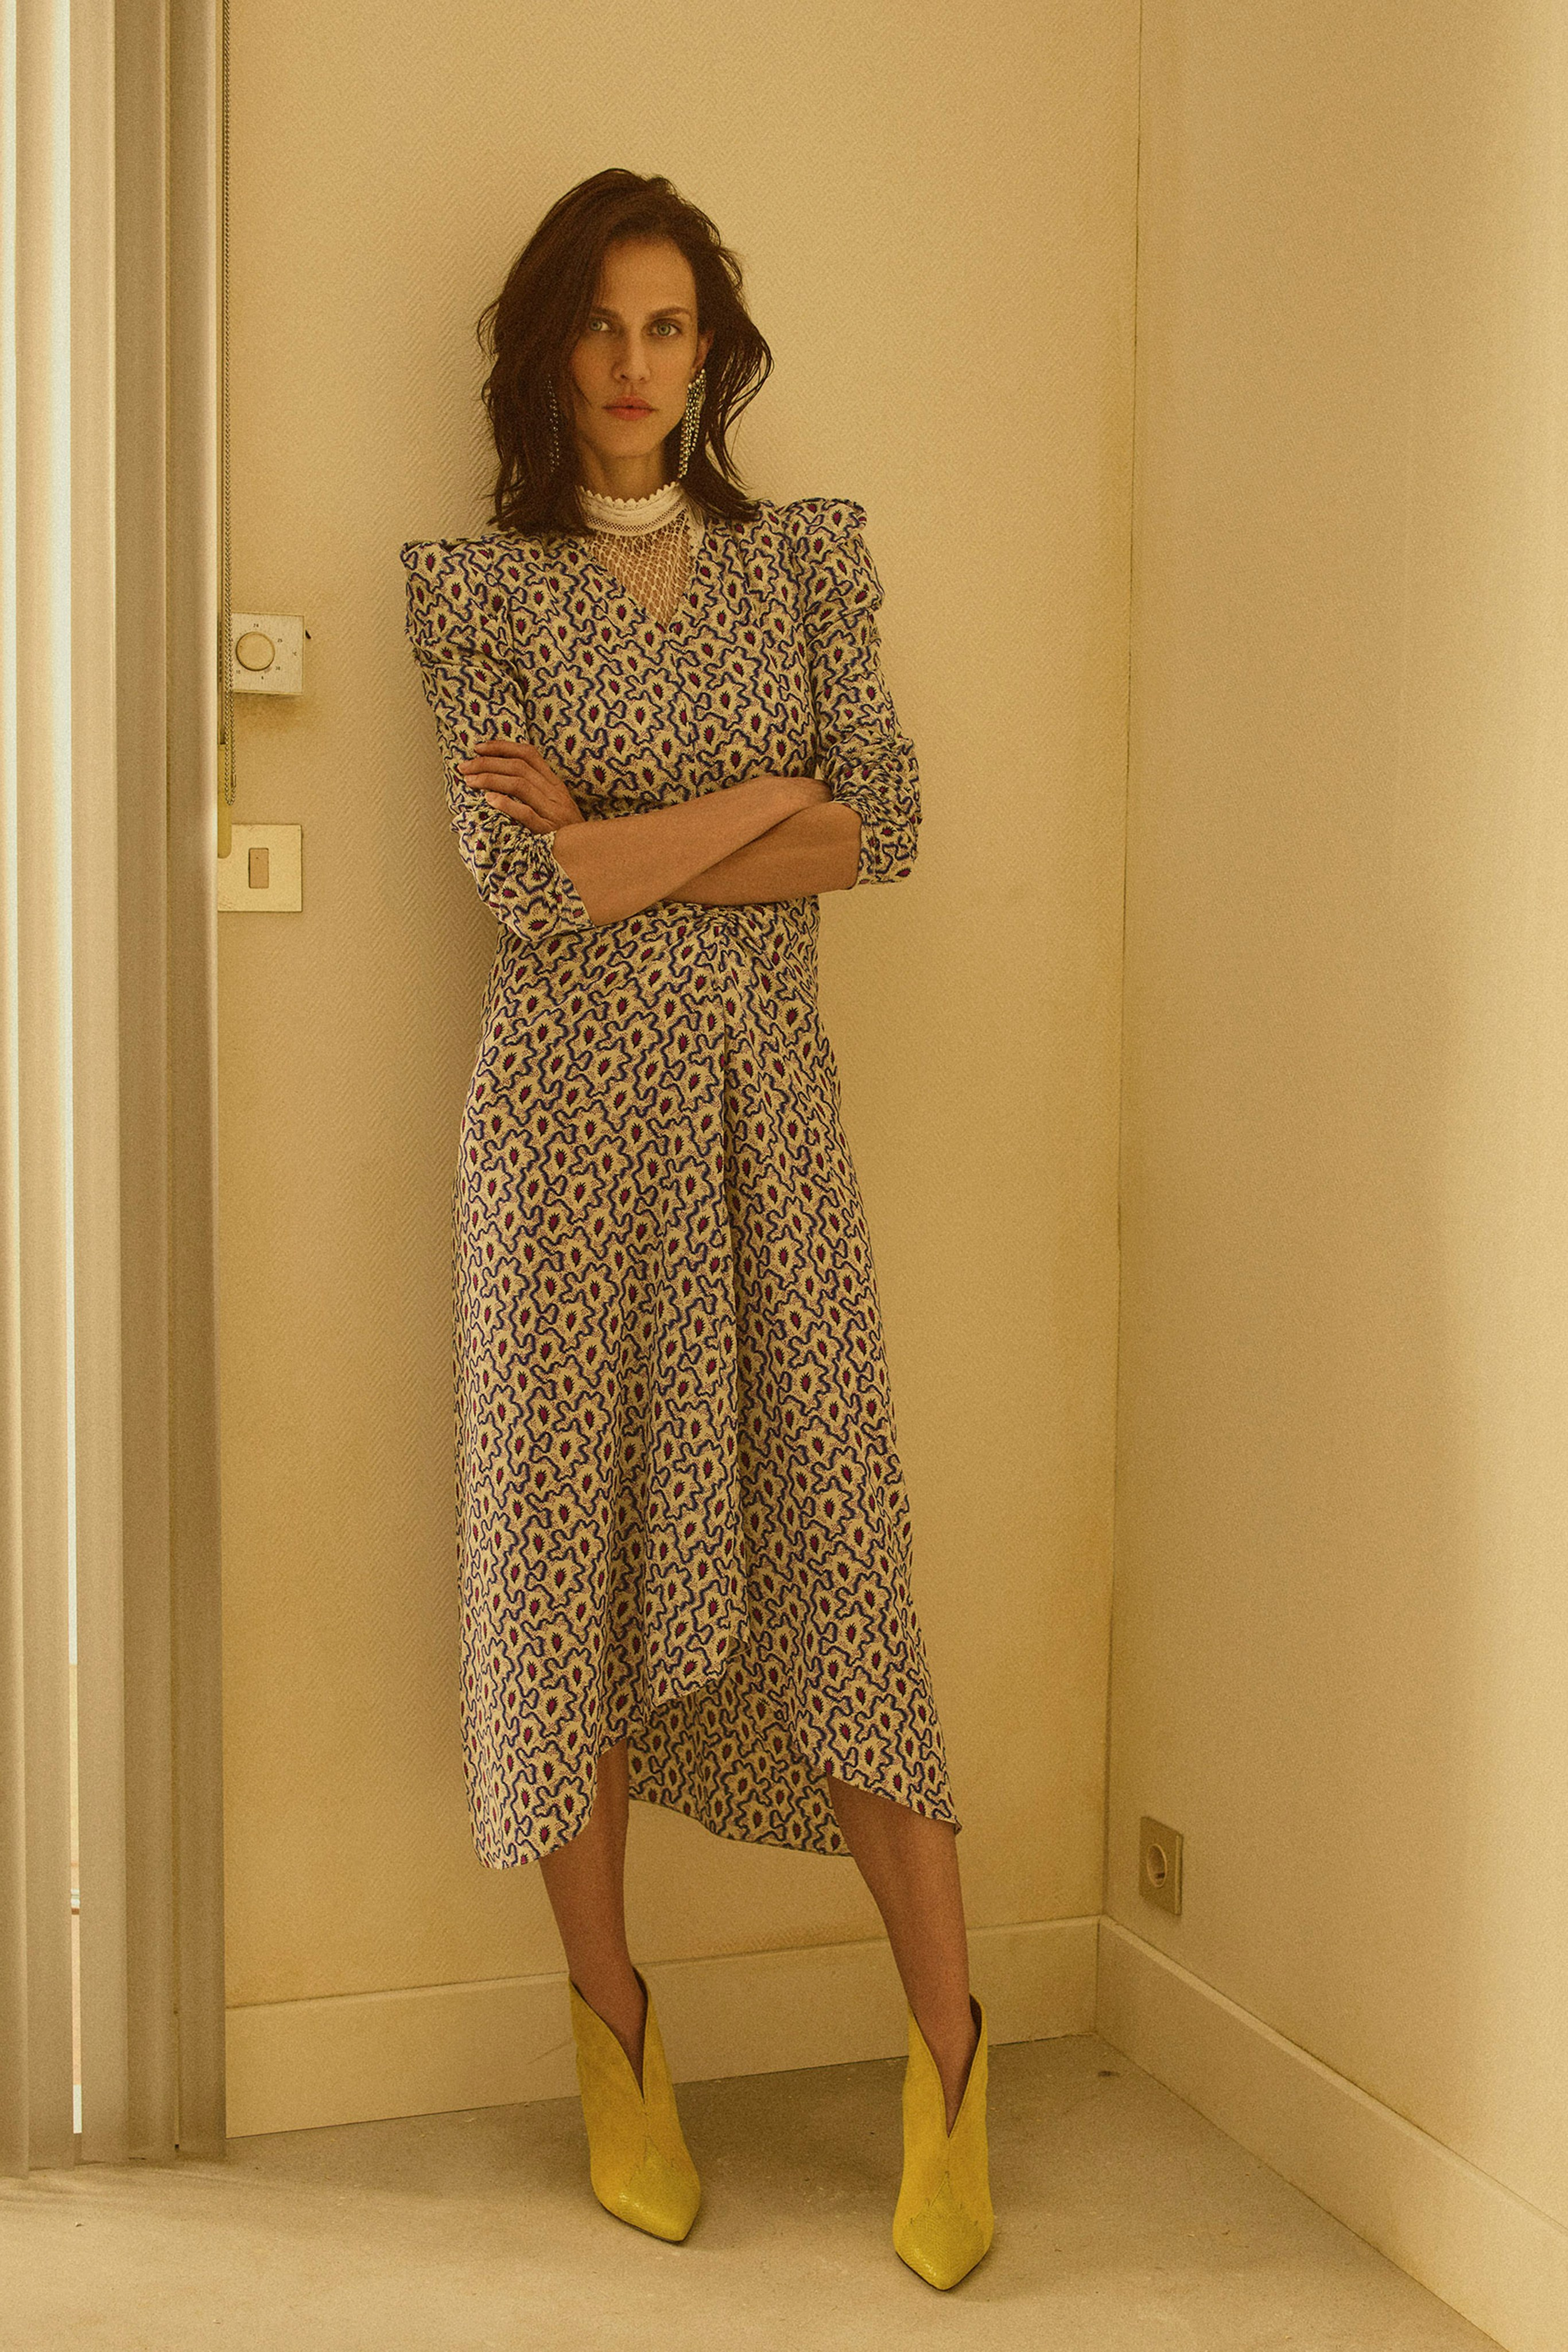 00006-Isabel-Marant-Resort-2019-Vogue-2019-pr